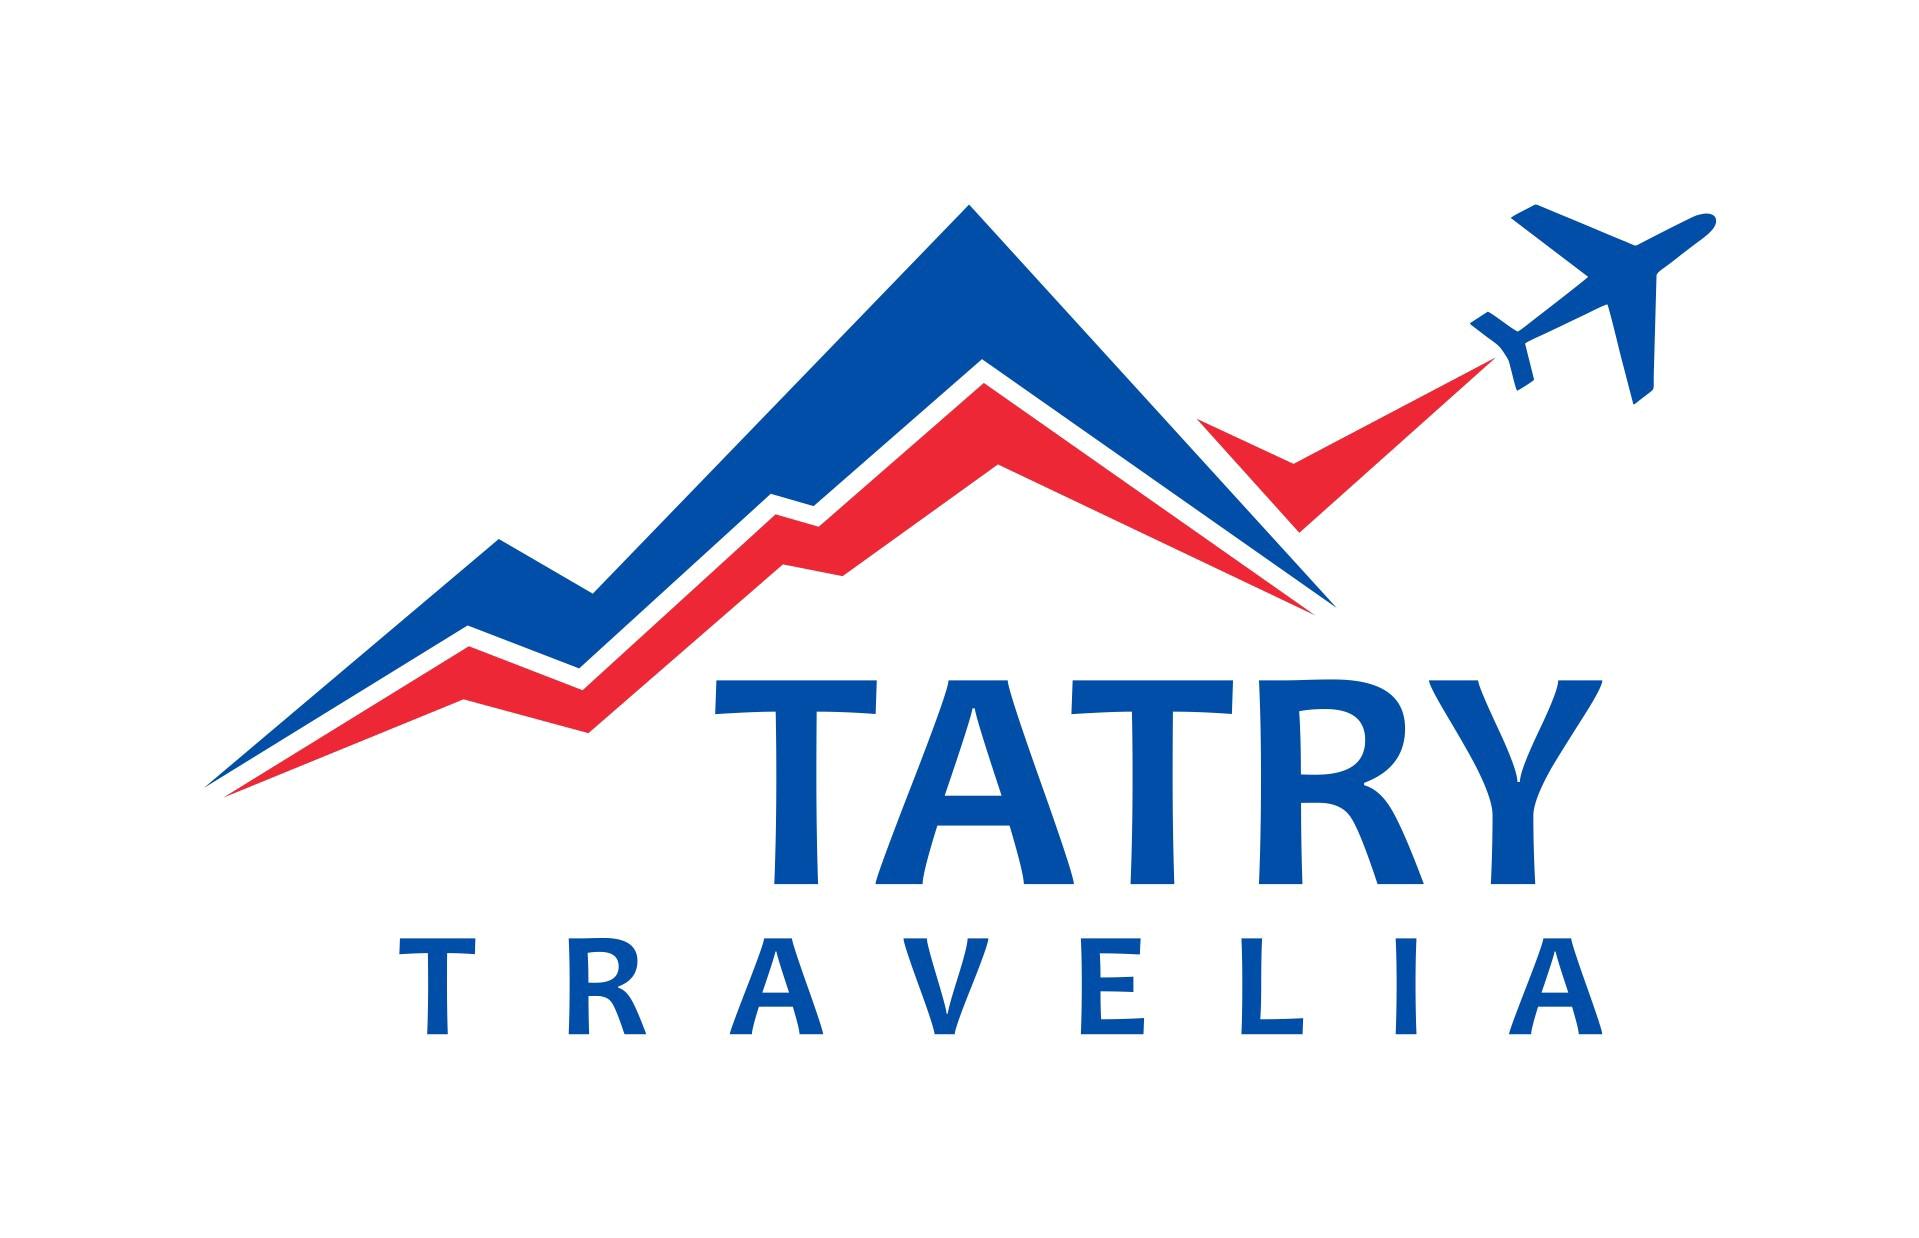 CK Tatry Travelia s.r.o.